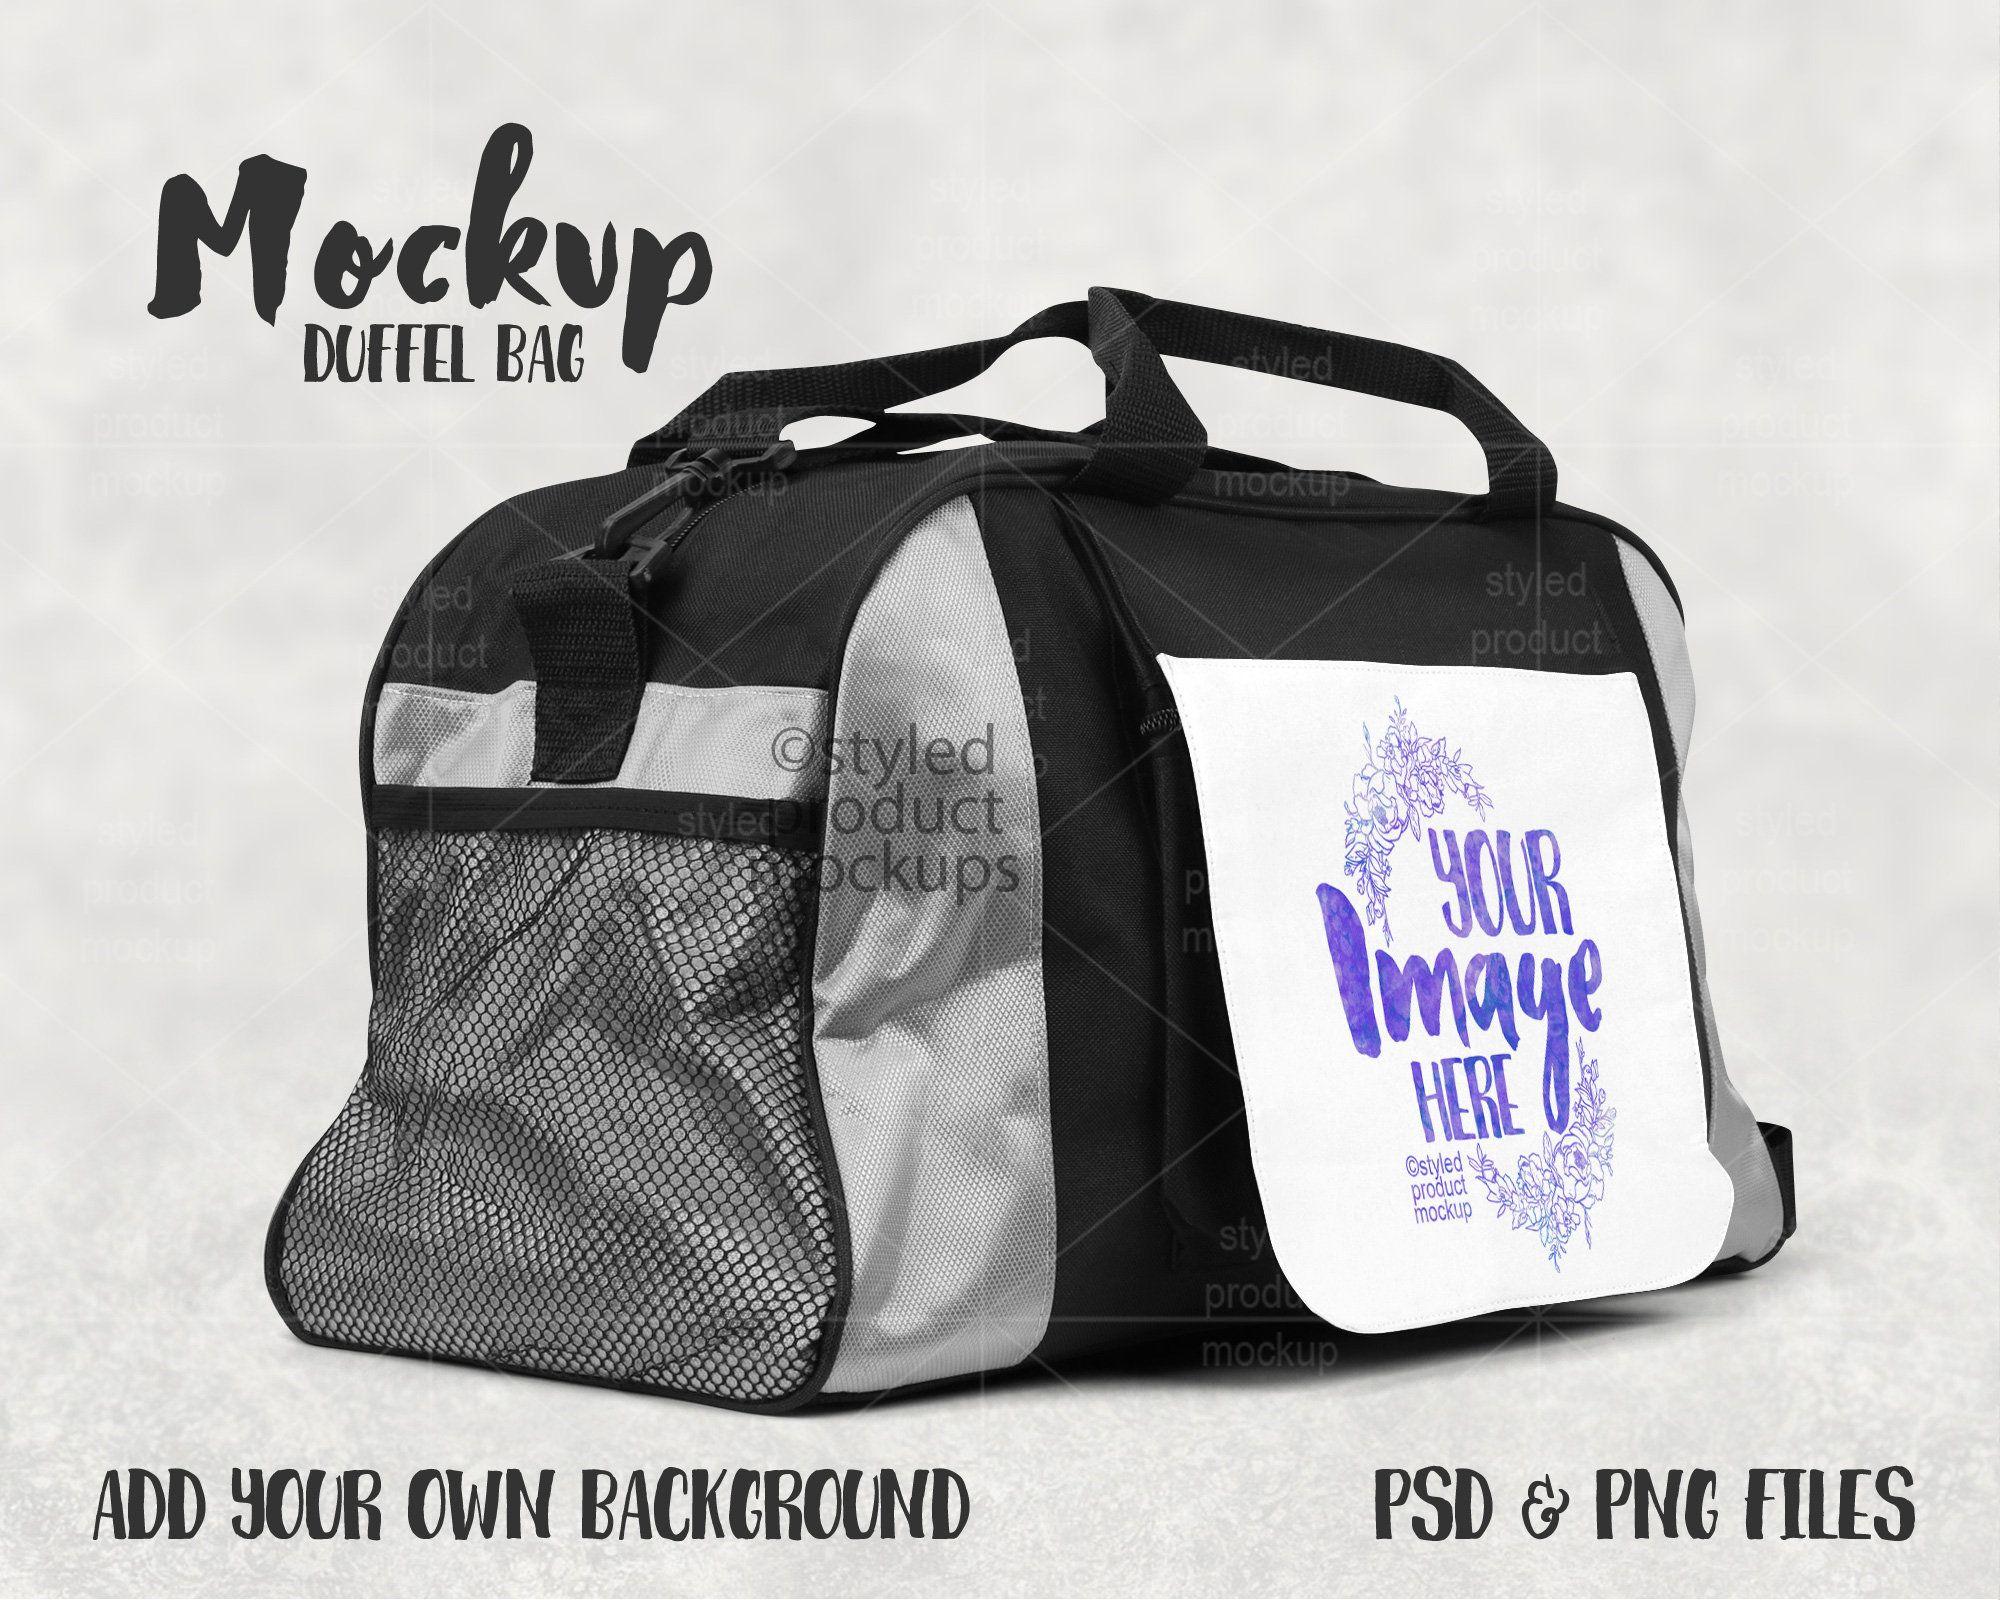 Download Dye Sublimation Duffel Bag Mockup Add Your Own Image And Etsy Bag Mockup Duffel Bag Duffel